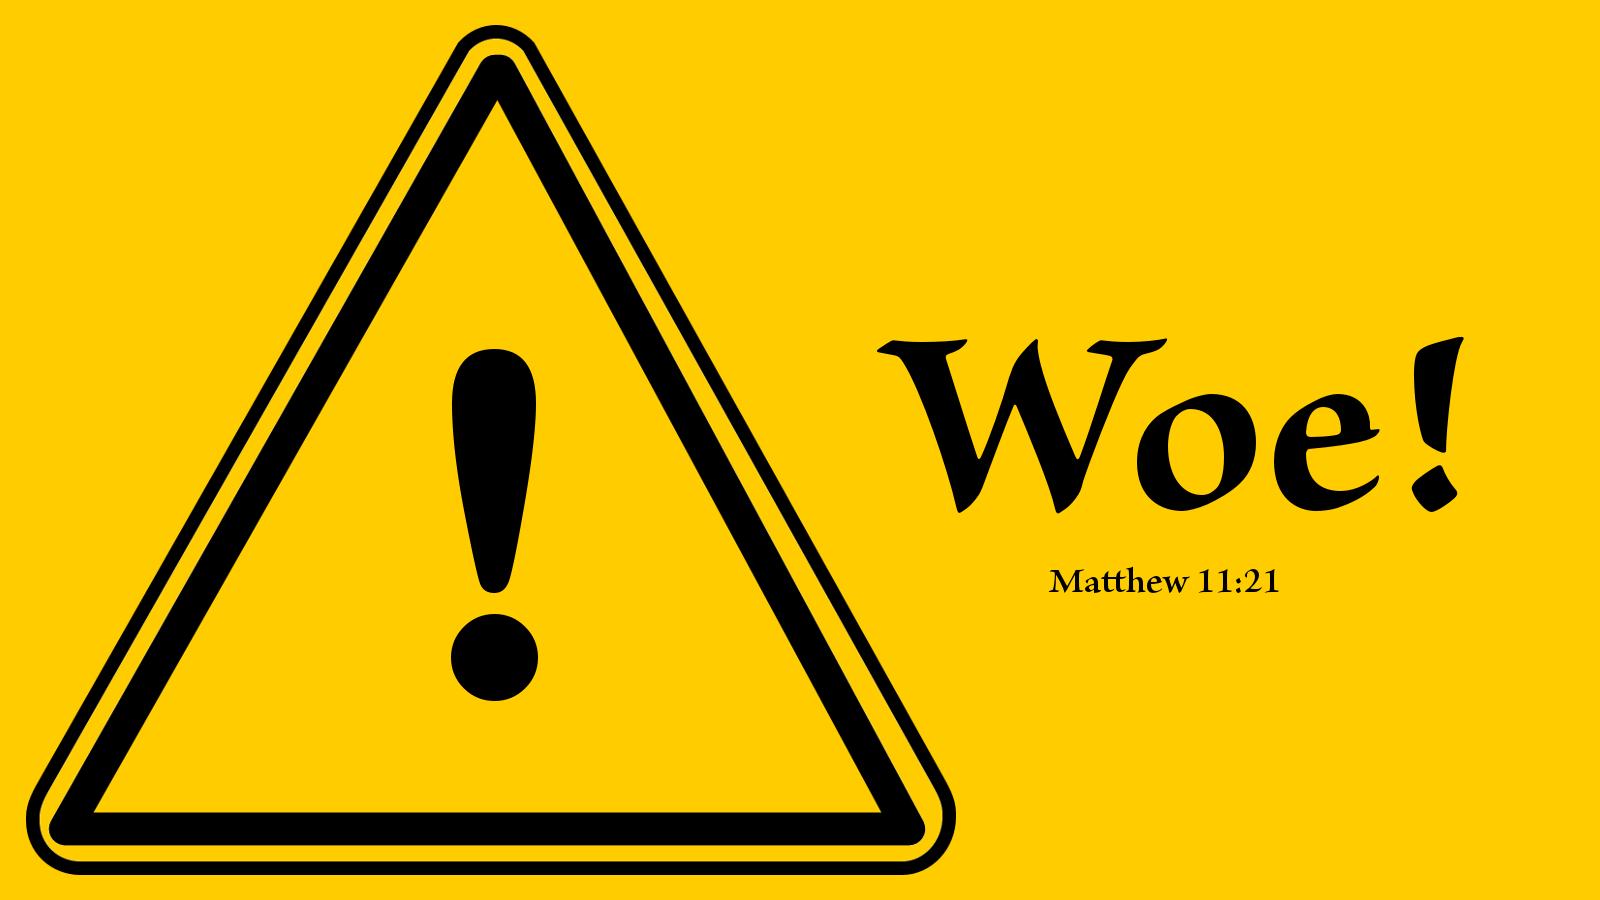 matthew11-21